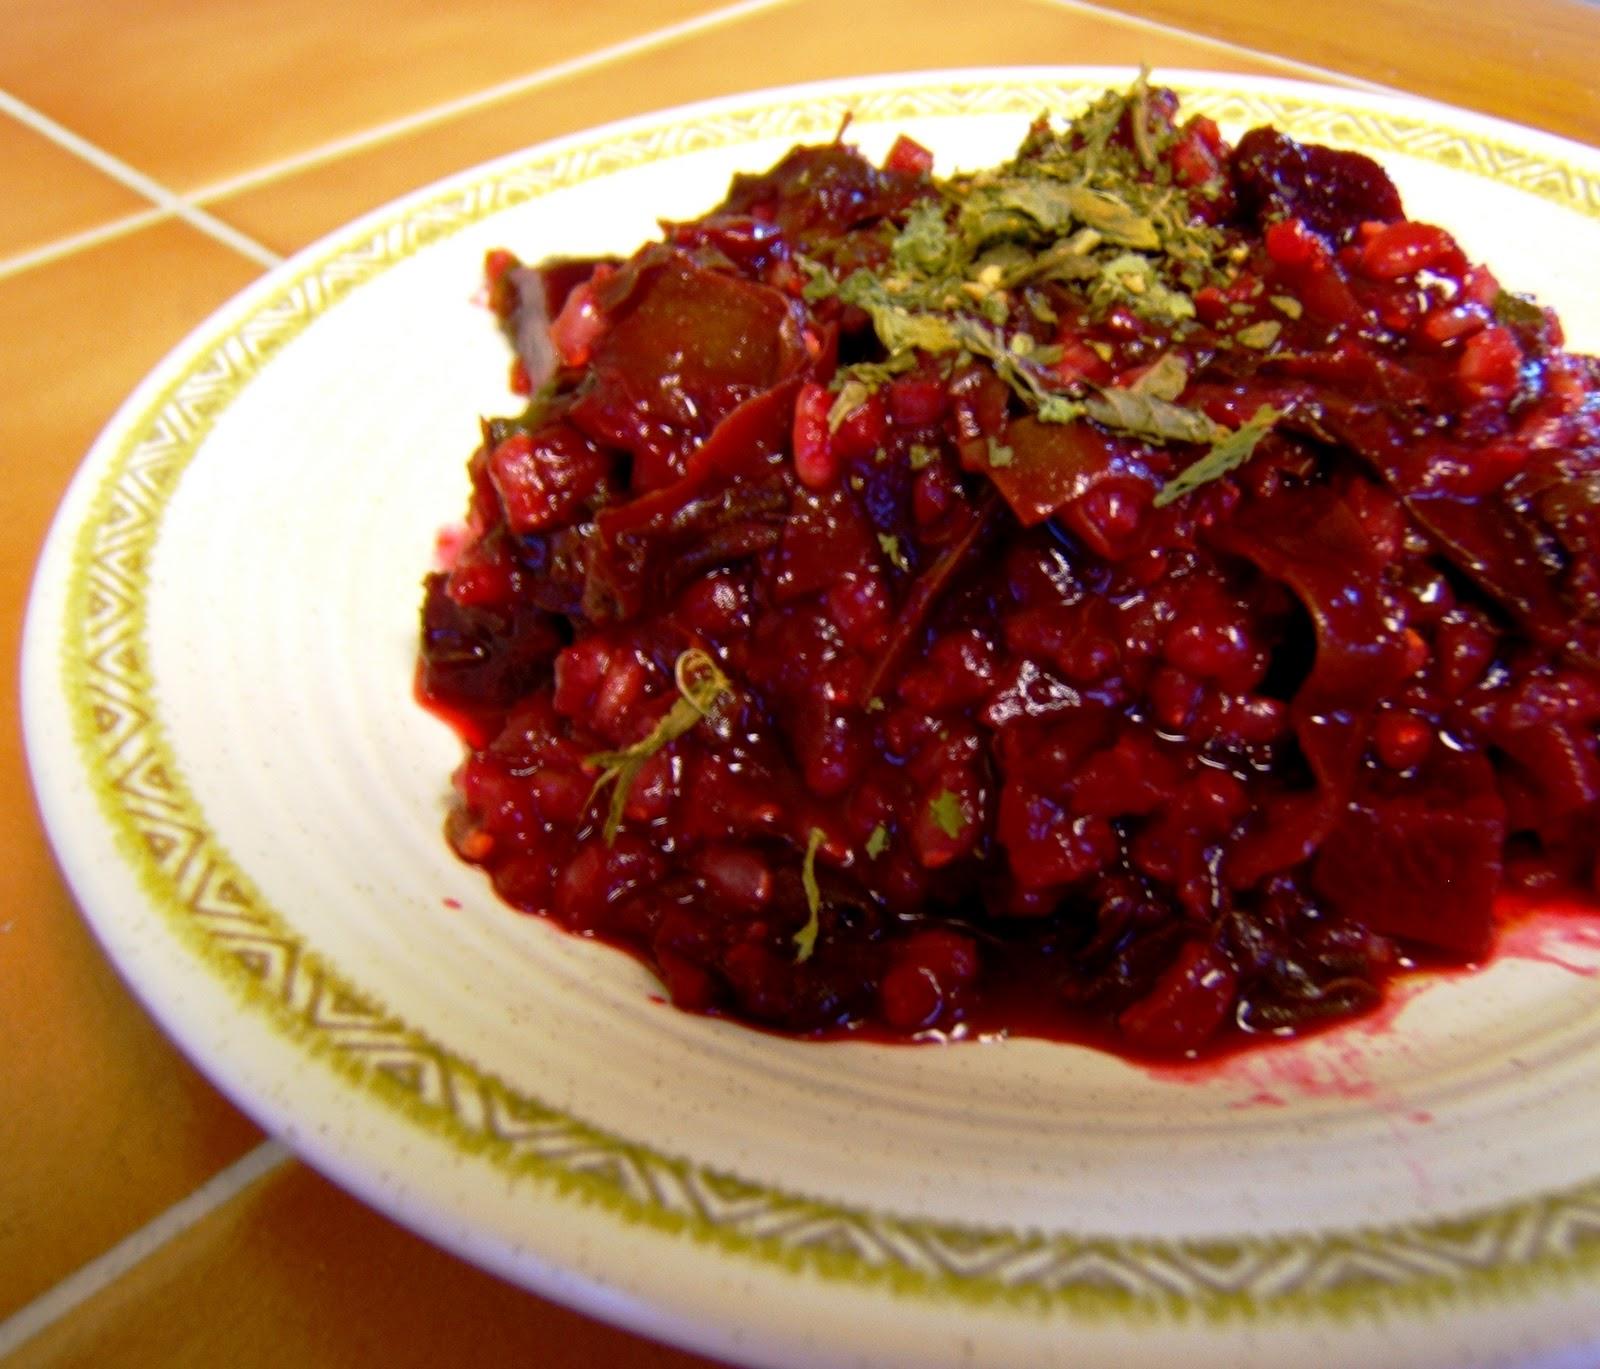 How to Make Shorbat Rumman Iraqi Pomegranate Soup (Vegetarian) recommendations